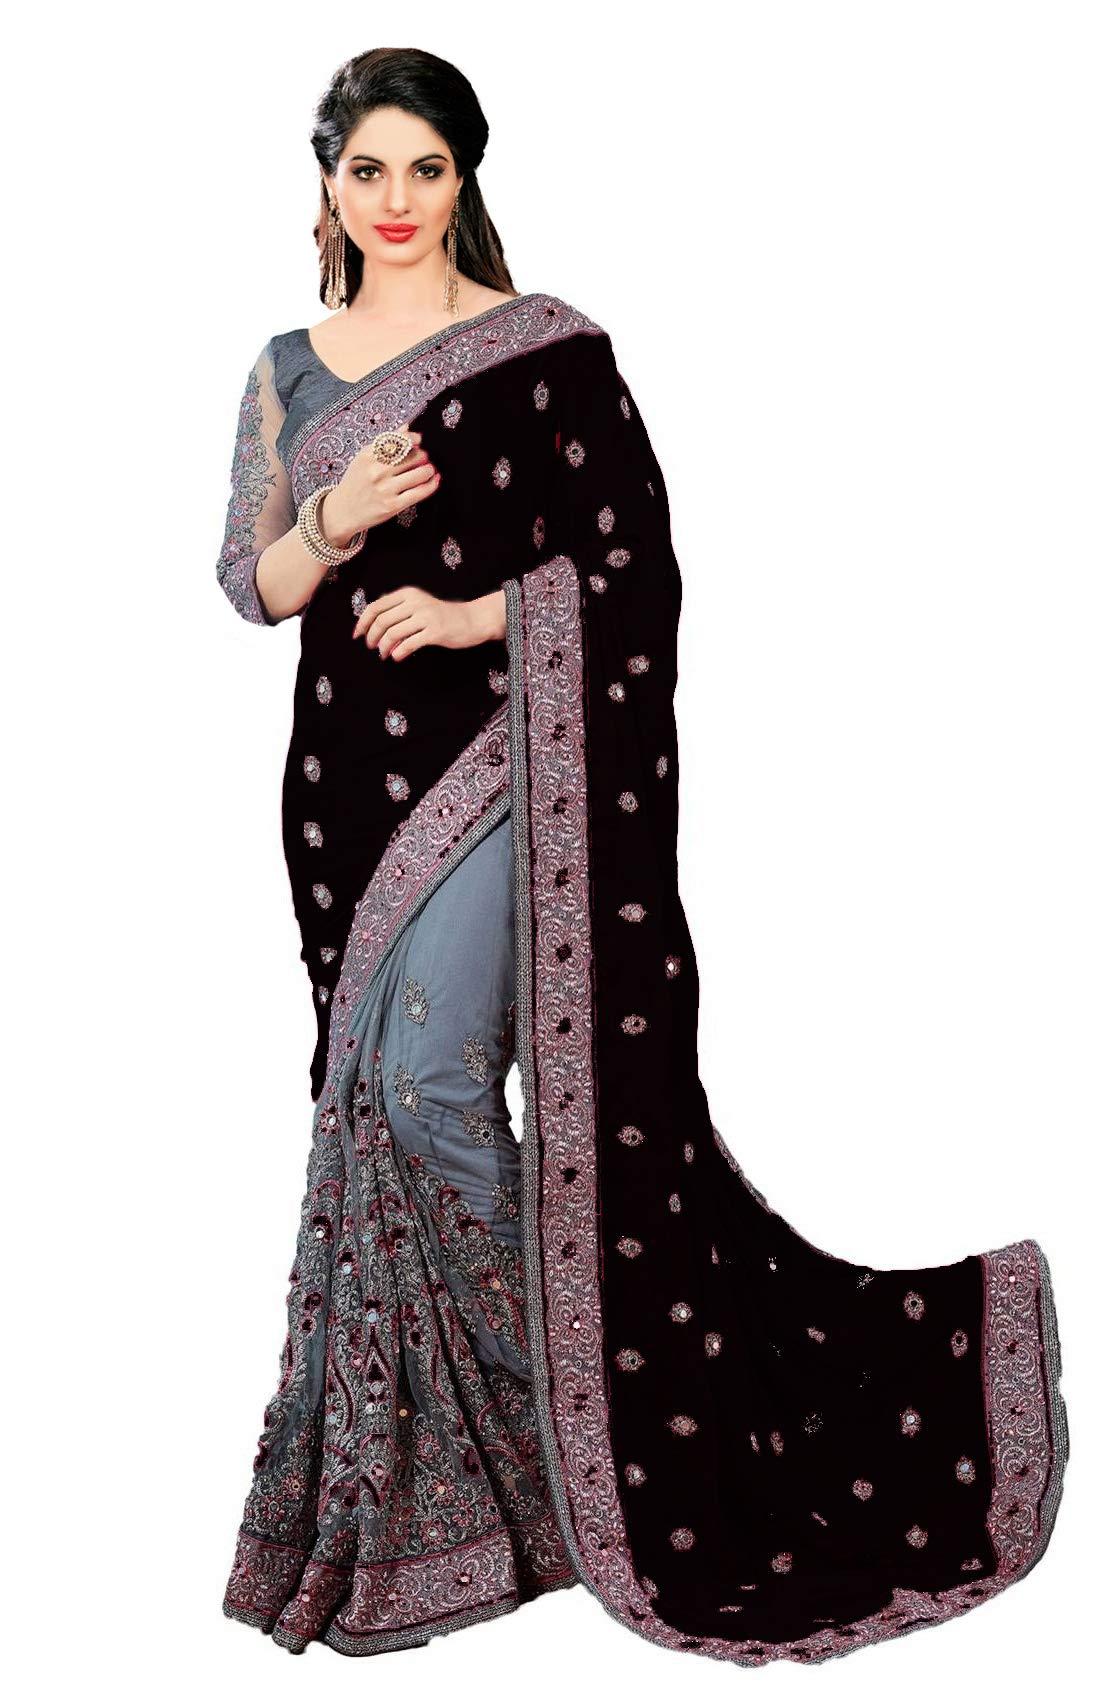 Nivah Fashion Women's Satin & Net Embroidery Saree with Blouse Piece(K608-Black-Free Size) (B07HP7RSH1) Amazon Price History, Amazon Price Tracker